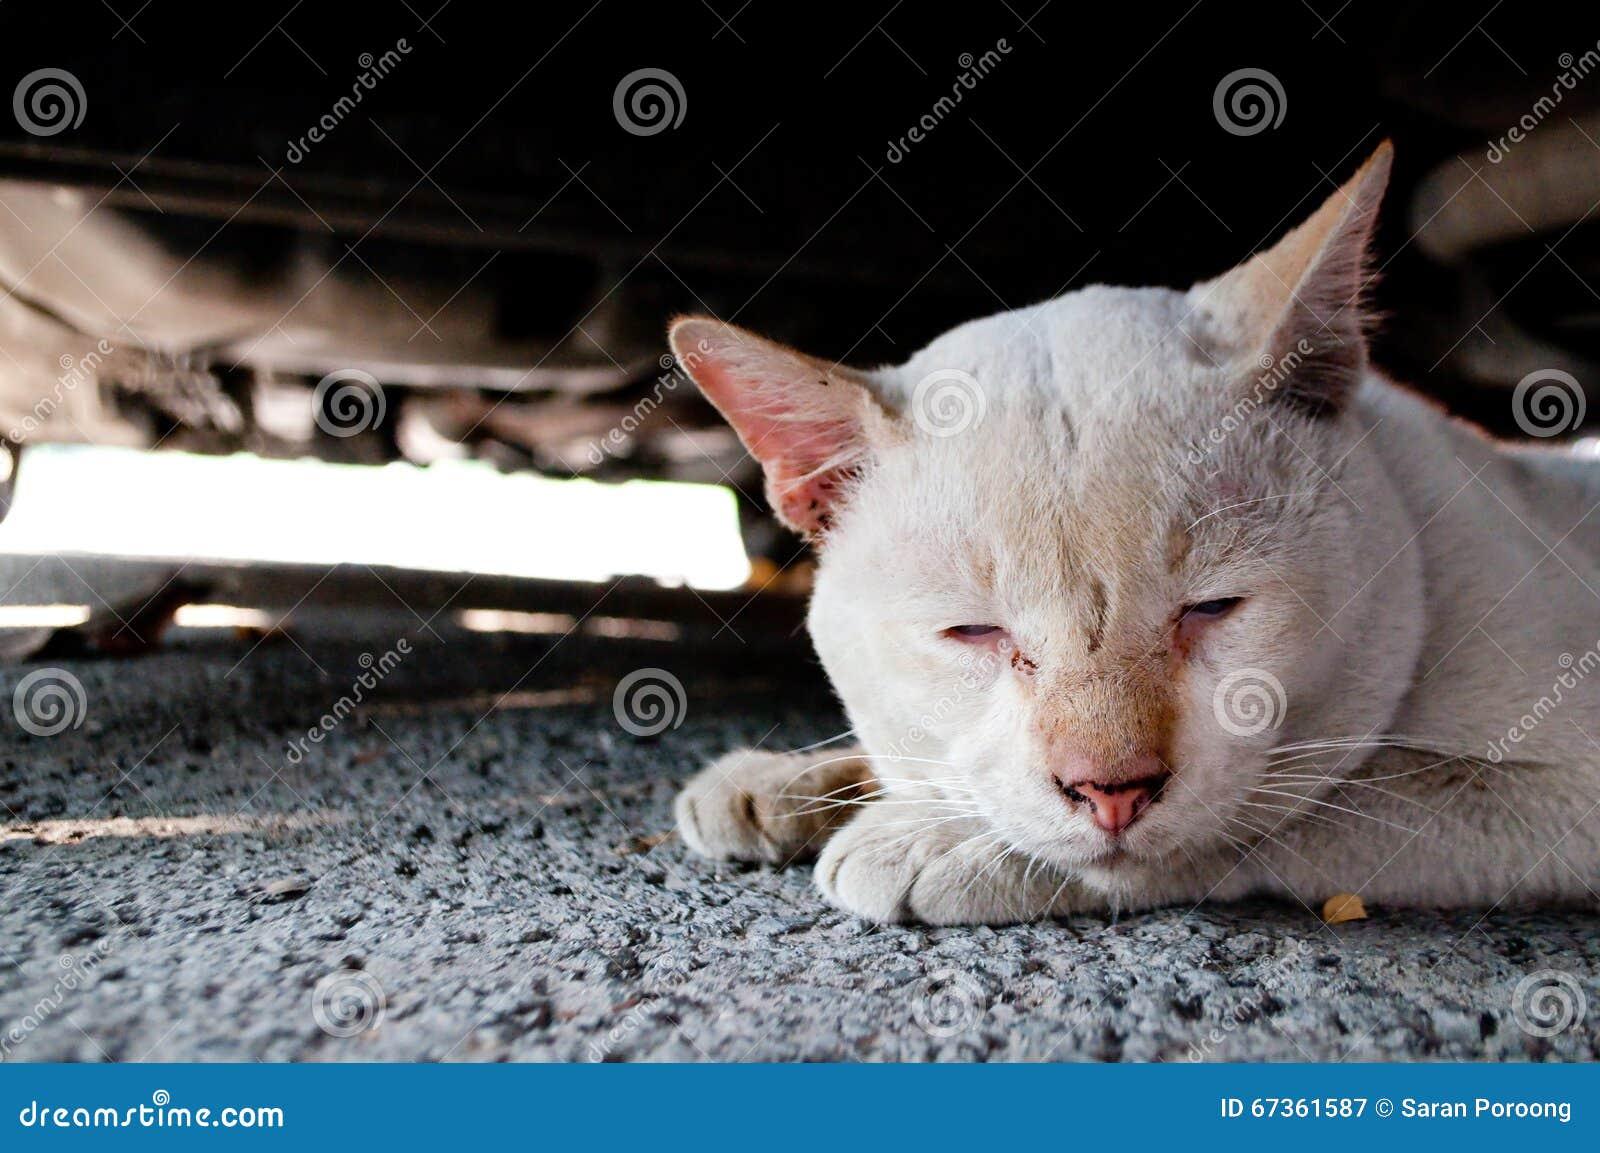 lonely sad cat - photo #15